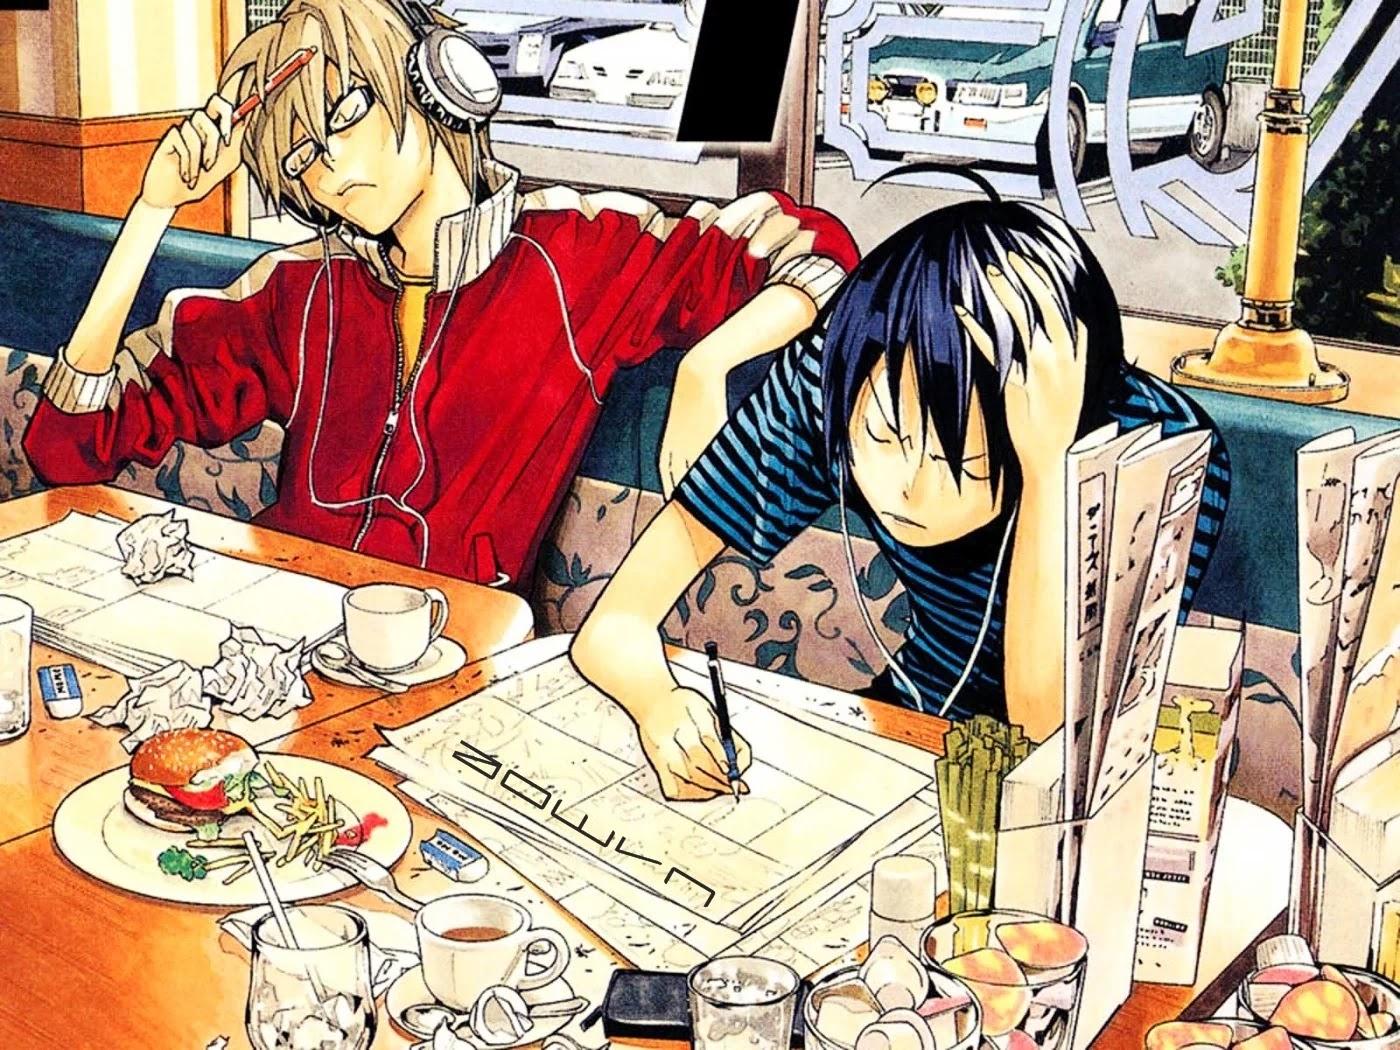 bakuman aowvn%2B%25283%2529 - [ Anime 3gp Mp4 ] Bakuman SS1 + SS2 + SS3 | Vietsub - Cuộc Đời Mangaka